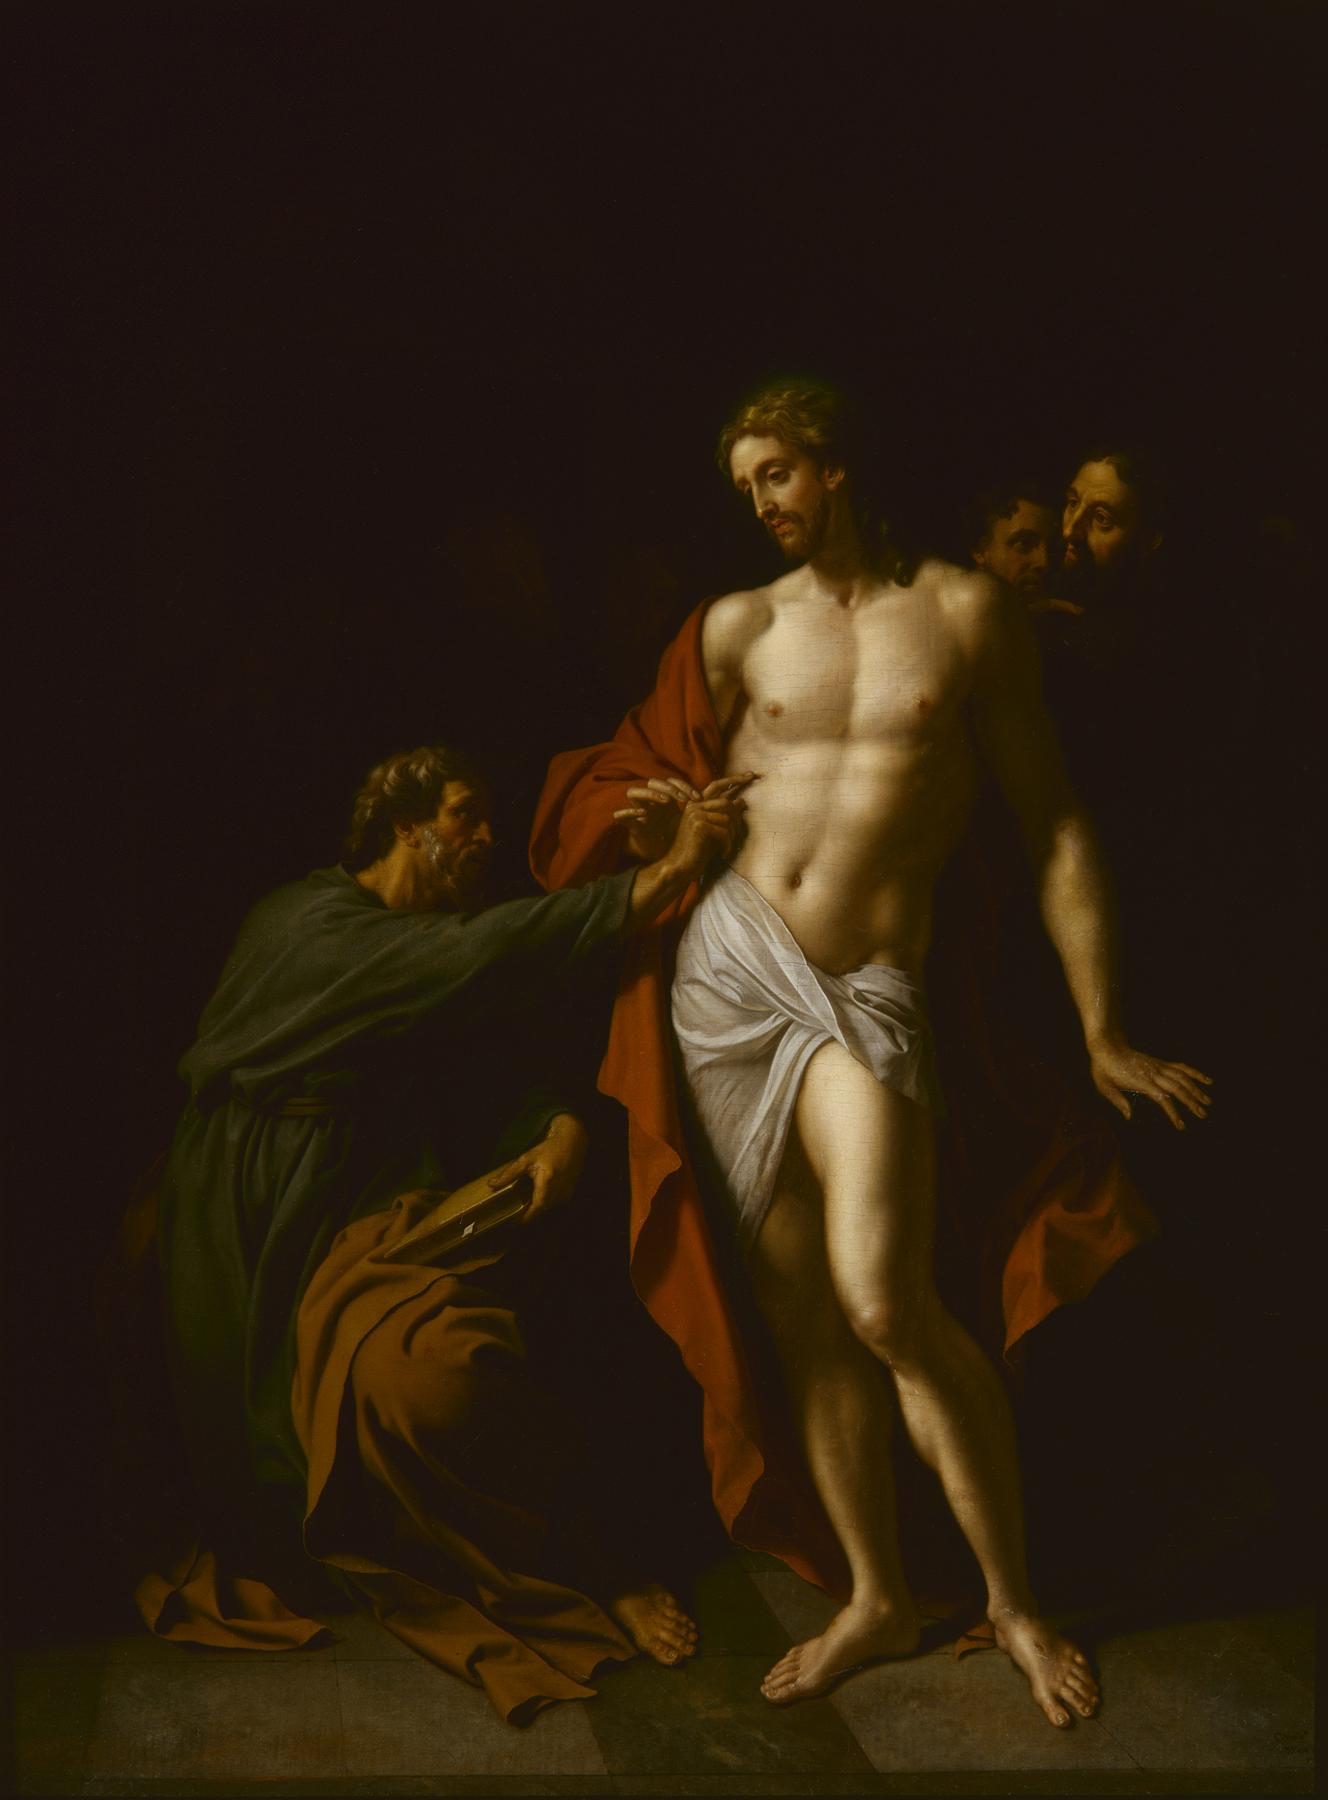 Adriaen van der Werff (Dutch, 1659–1722). Doubting Thomas (The Incredulity of St. Thomas), 1710. Oil on wood panel. 24 15/16 × 18 15/16 in. (63.34 × 48.1 cm). Milwaukee Art Museum, Gift of Mr. and Mrs. R. V. Krikorian M1971.60. Photo credit: P. Richard Eells.